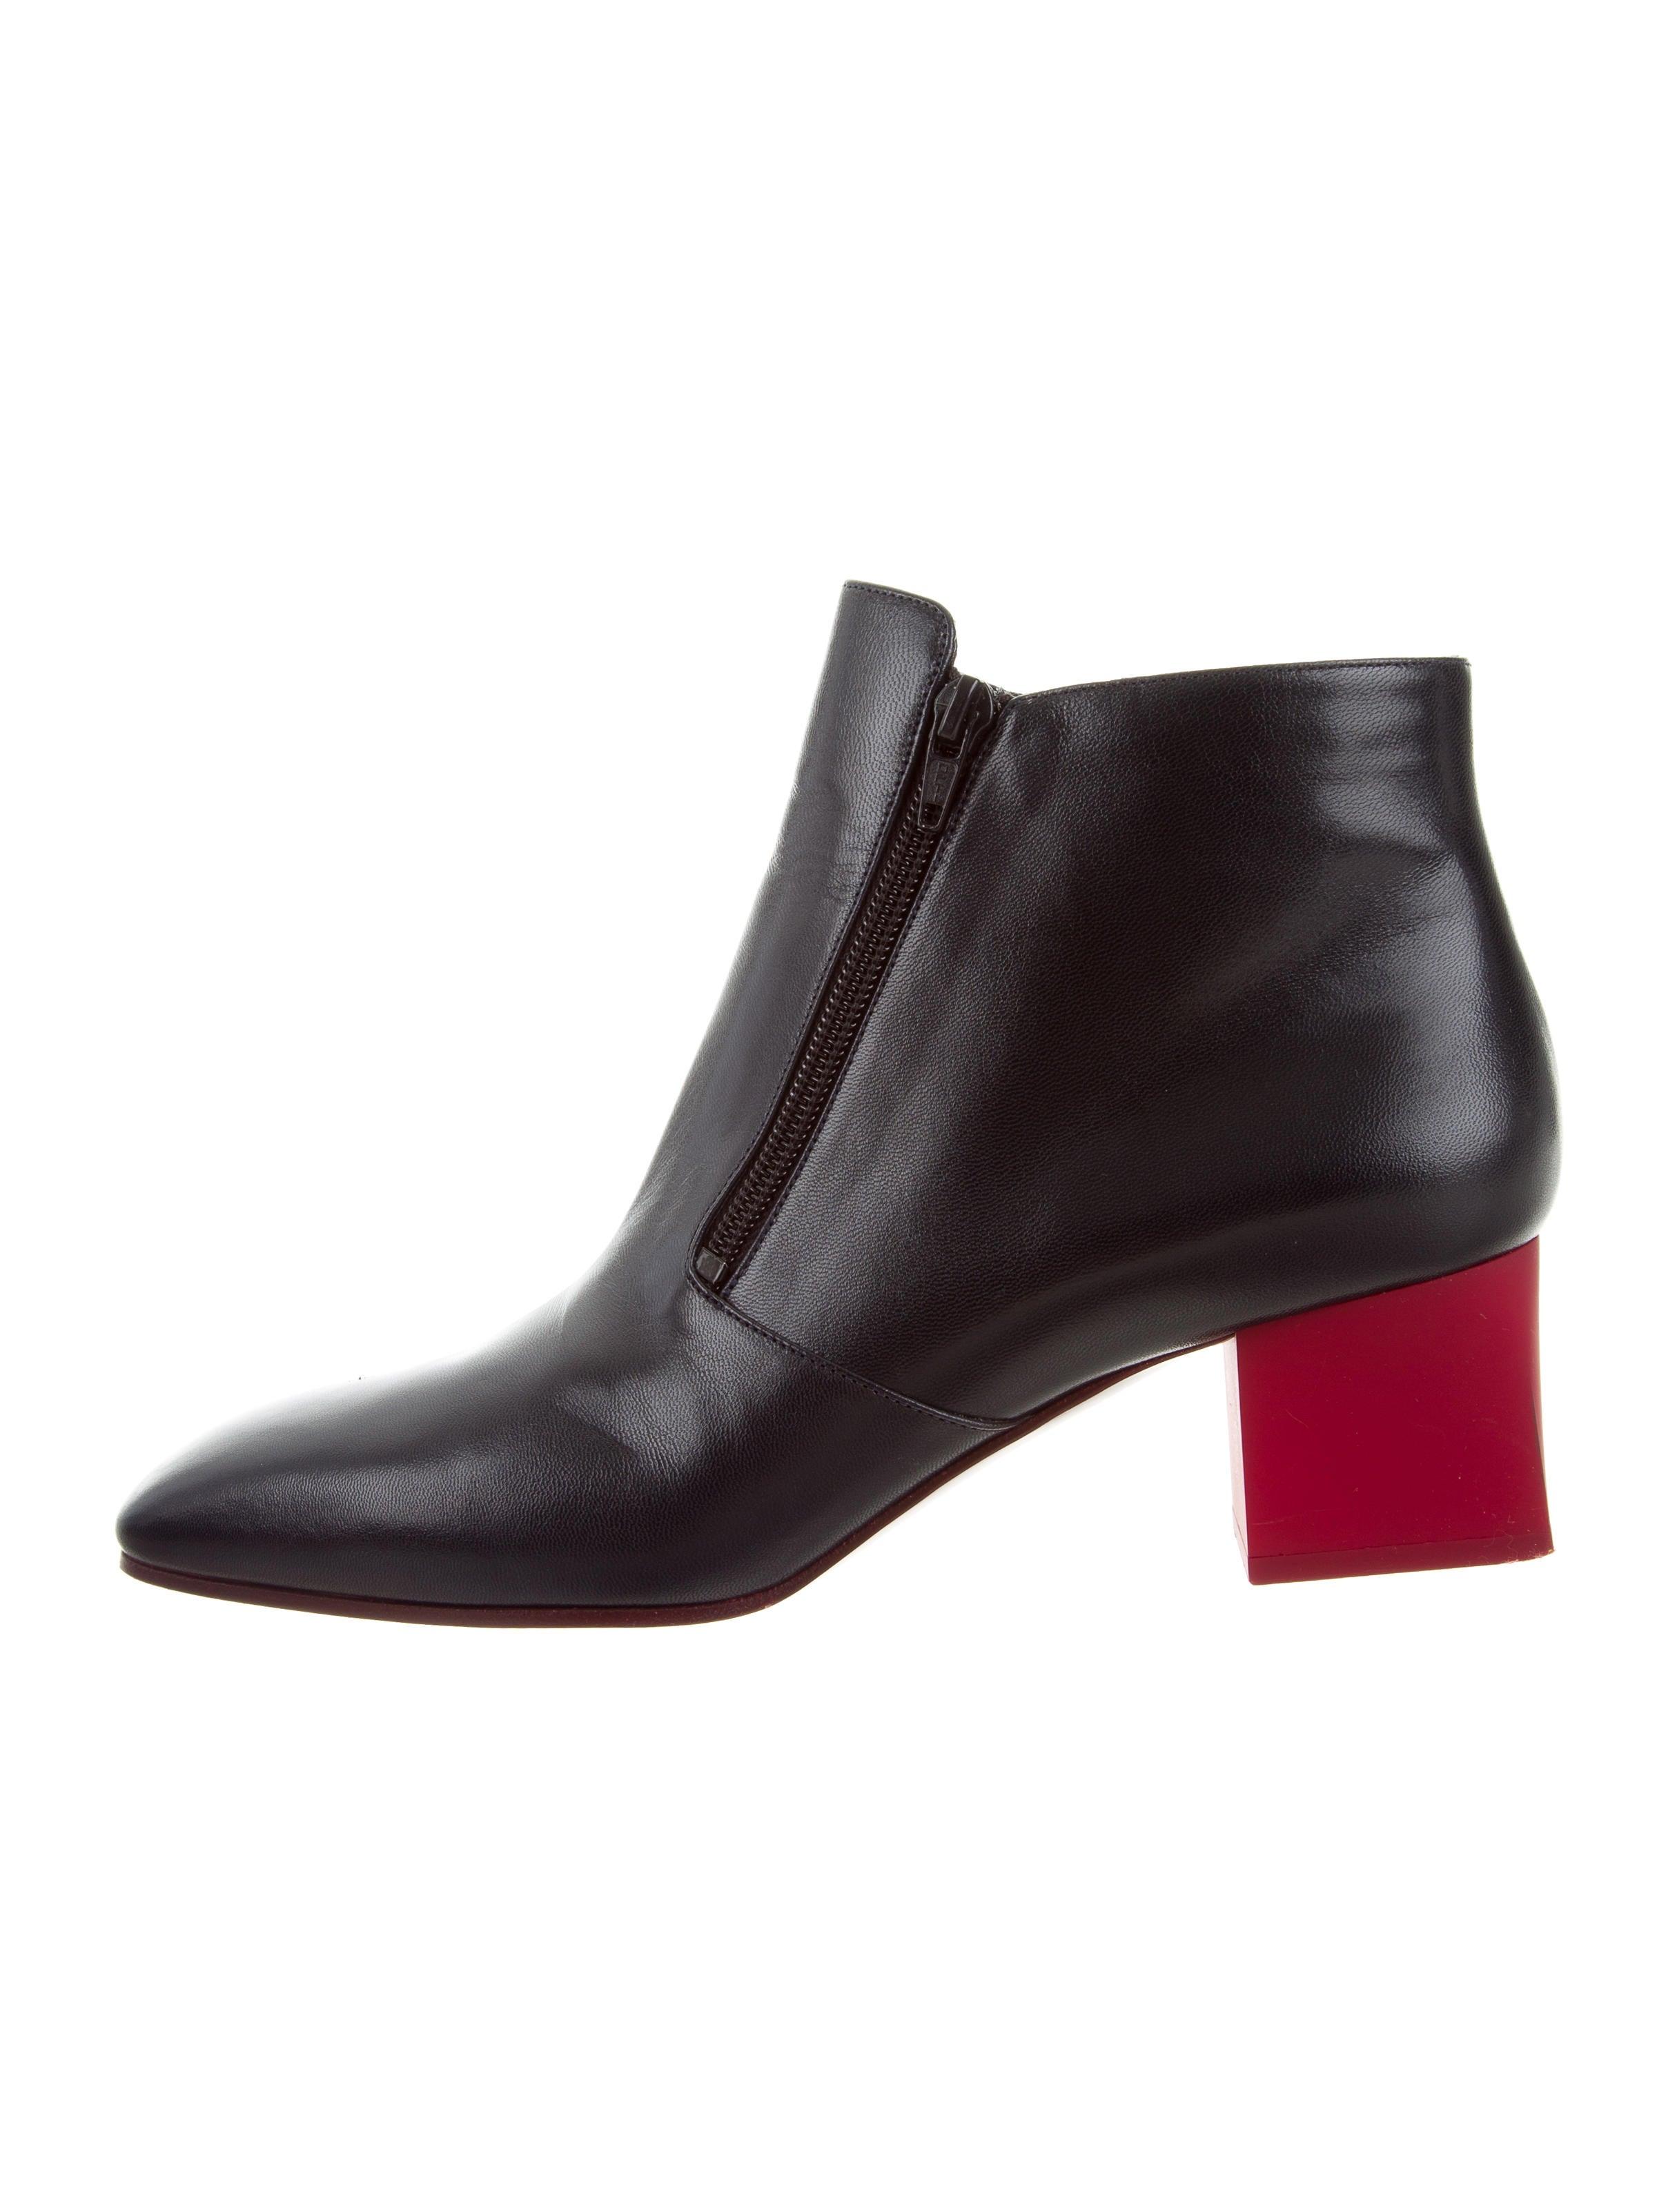 cheap sale professional cheap perfect Céline Leather Square-Toe Ankle Boots sale affordable 2014 new store cheap online RUqNqG